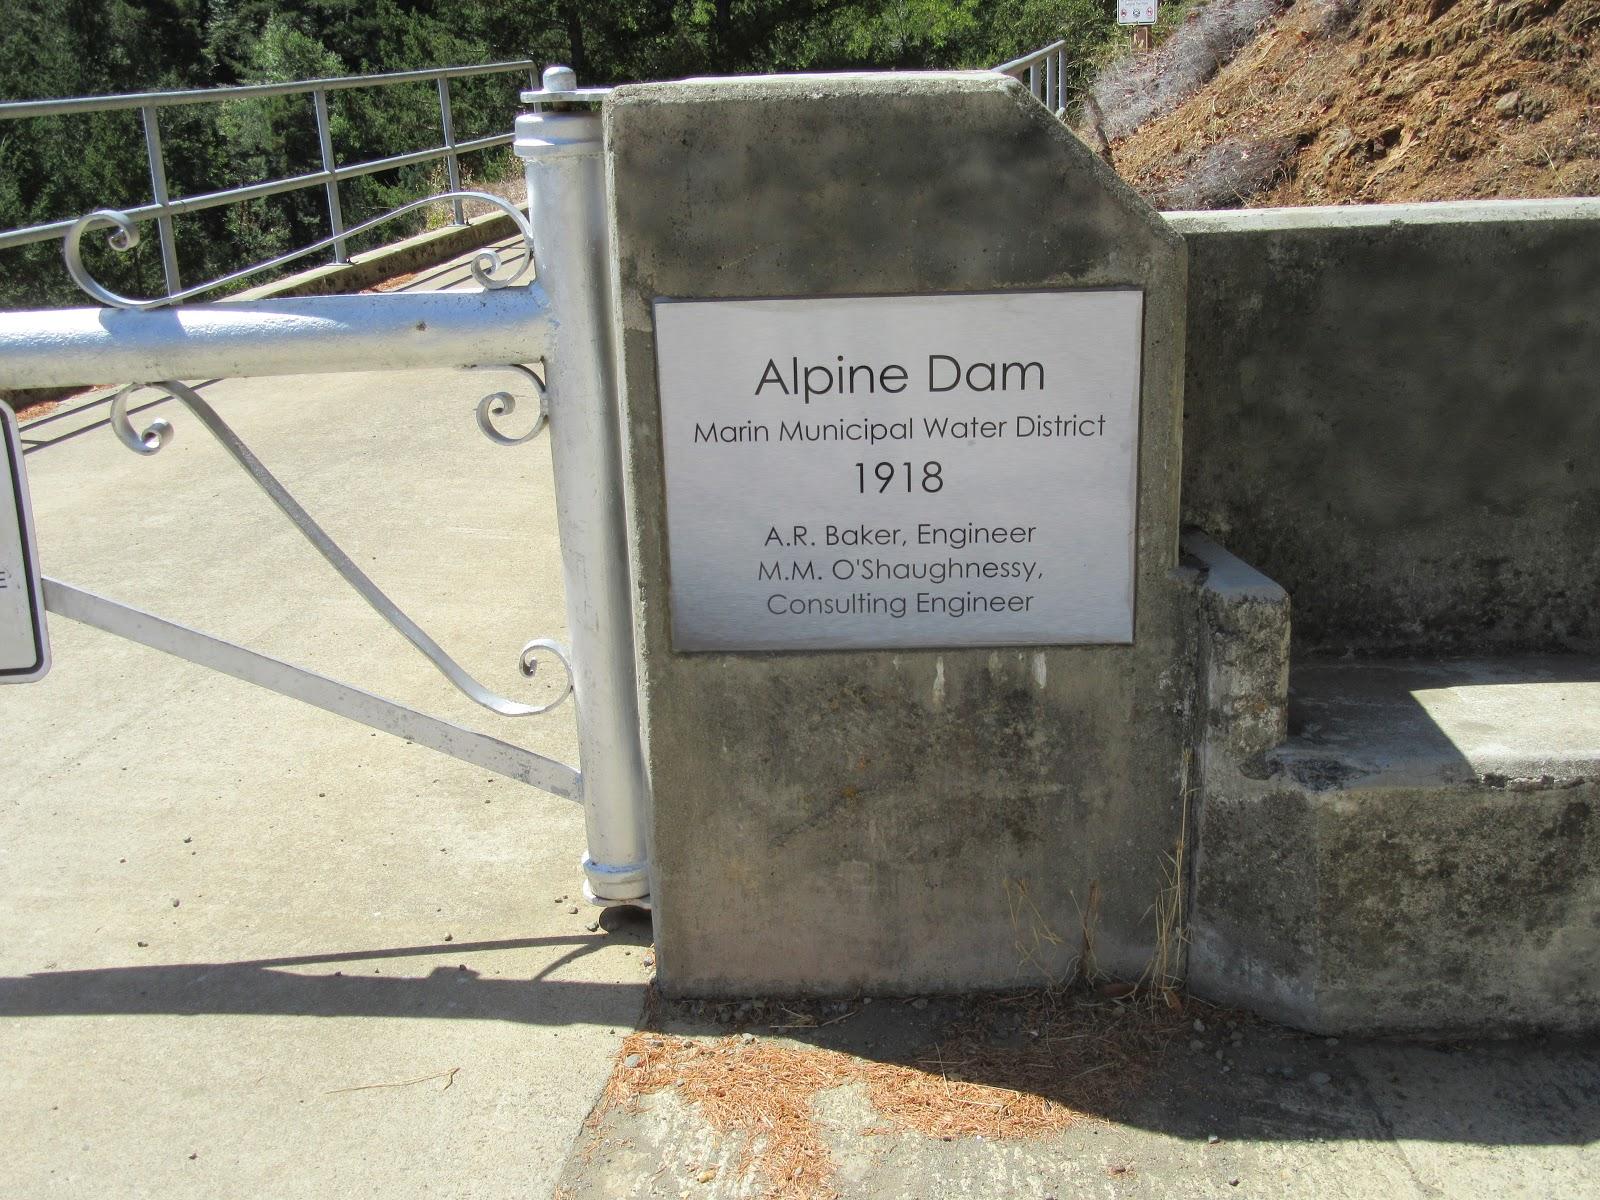 Bike climb Mt. Tamalpais from Alpine Dam - sign at Alpine Dam